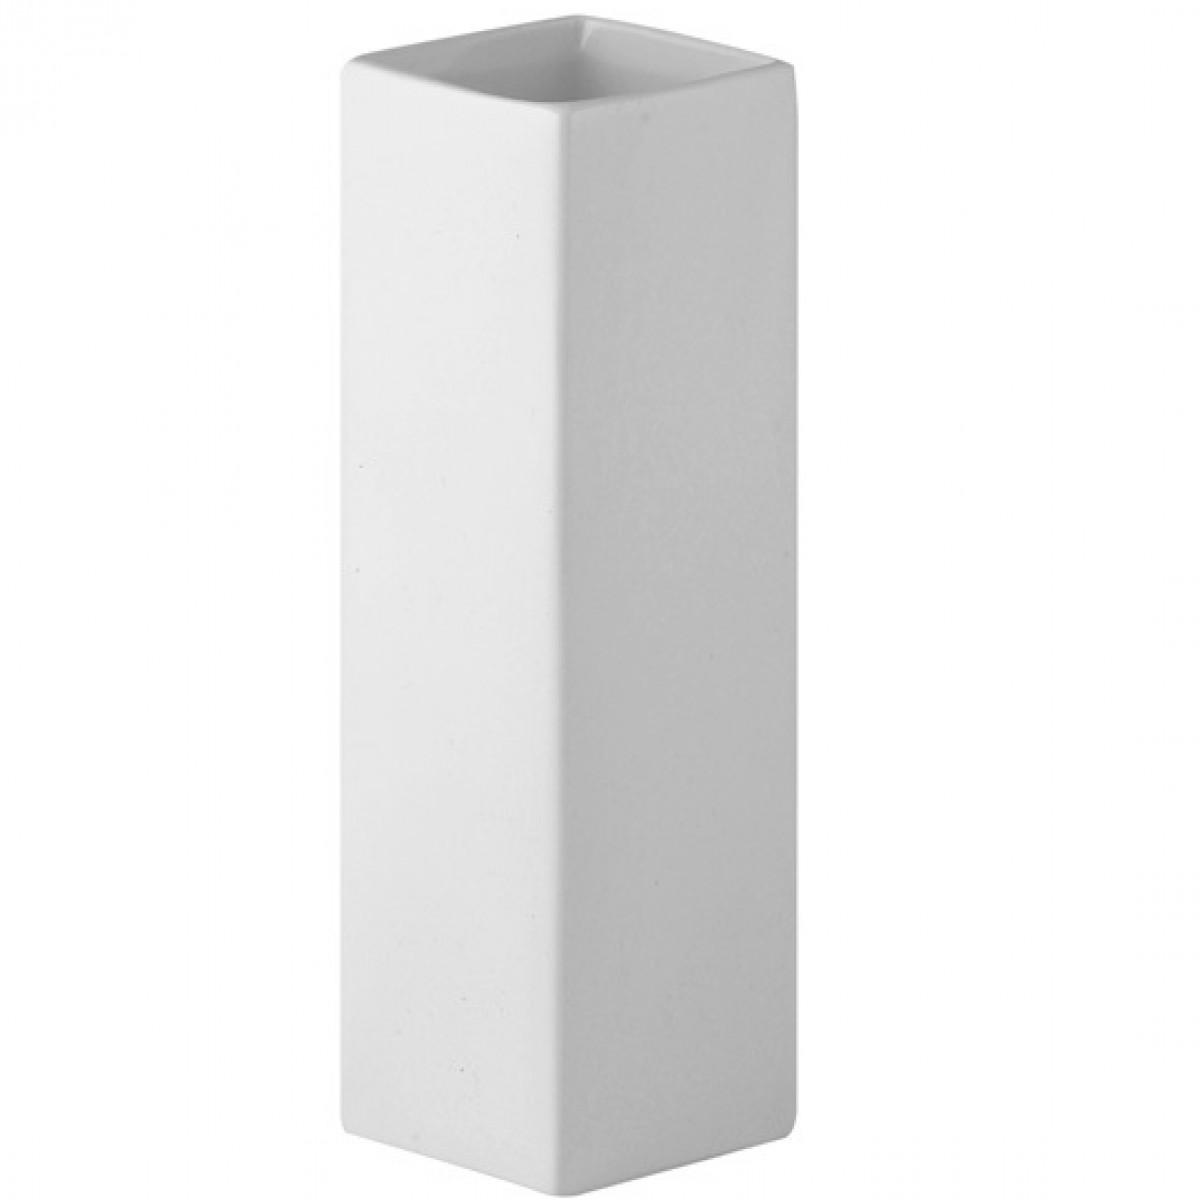 Cube White 12x12x25cm Acrylic Vase - 1 No